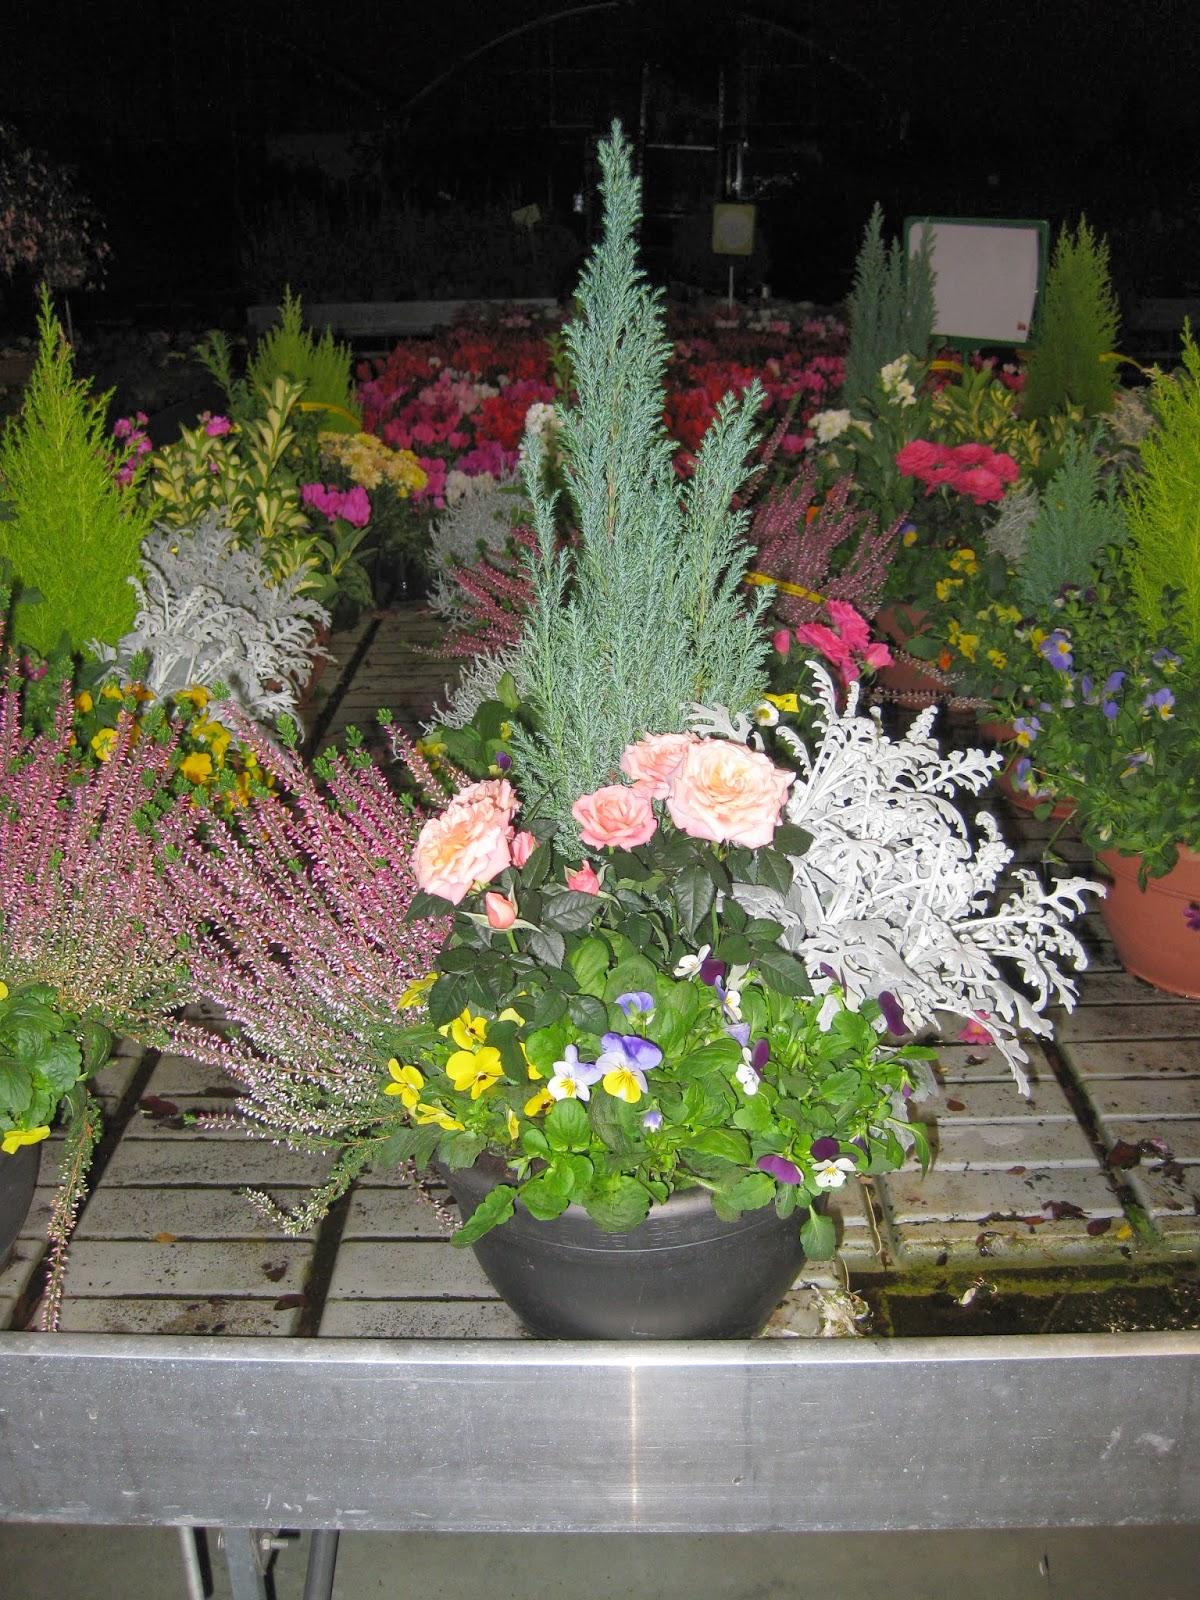 Hascarzaha askartza centro de jardiner a mandragora for Centro de jardineria